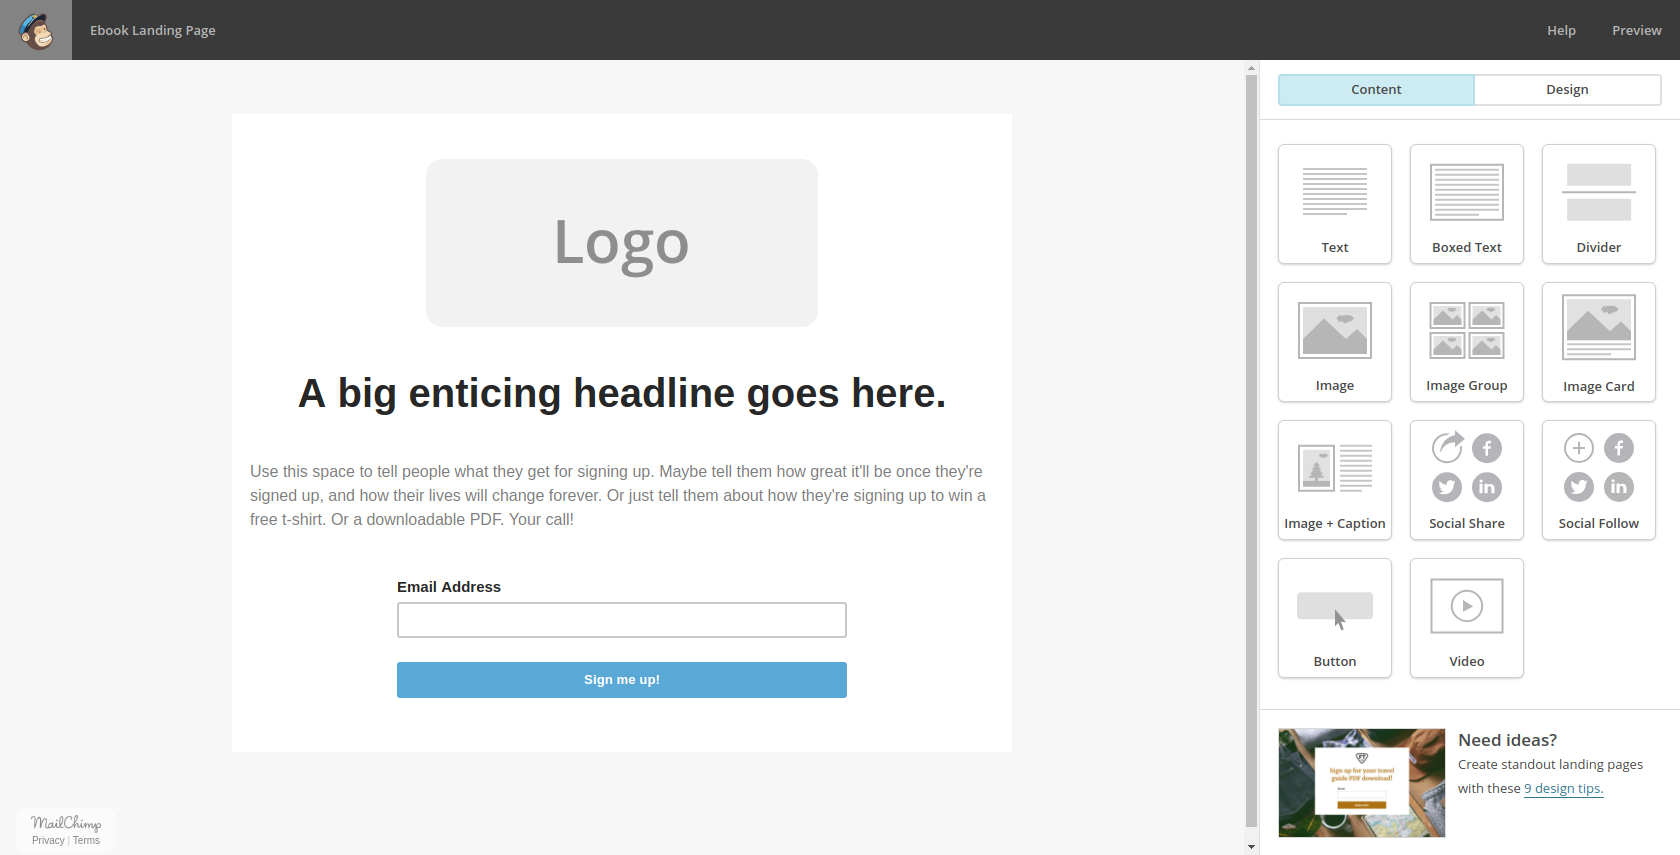 Mailchimp Landing Page Builder Template